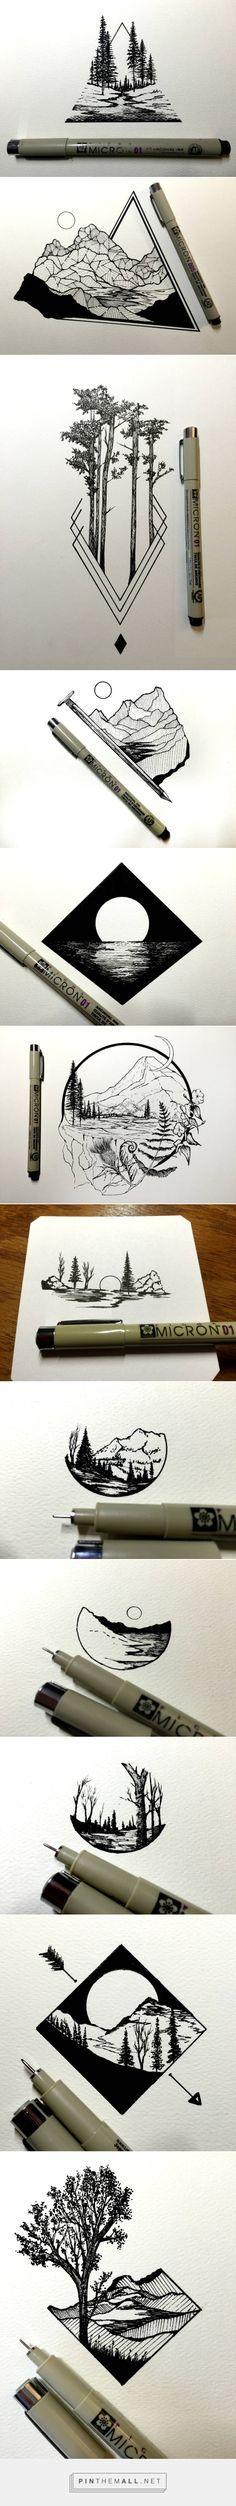 Daily Drawings by Derek Myers – Fubiz Media - created via https://pinthemall.net